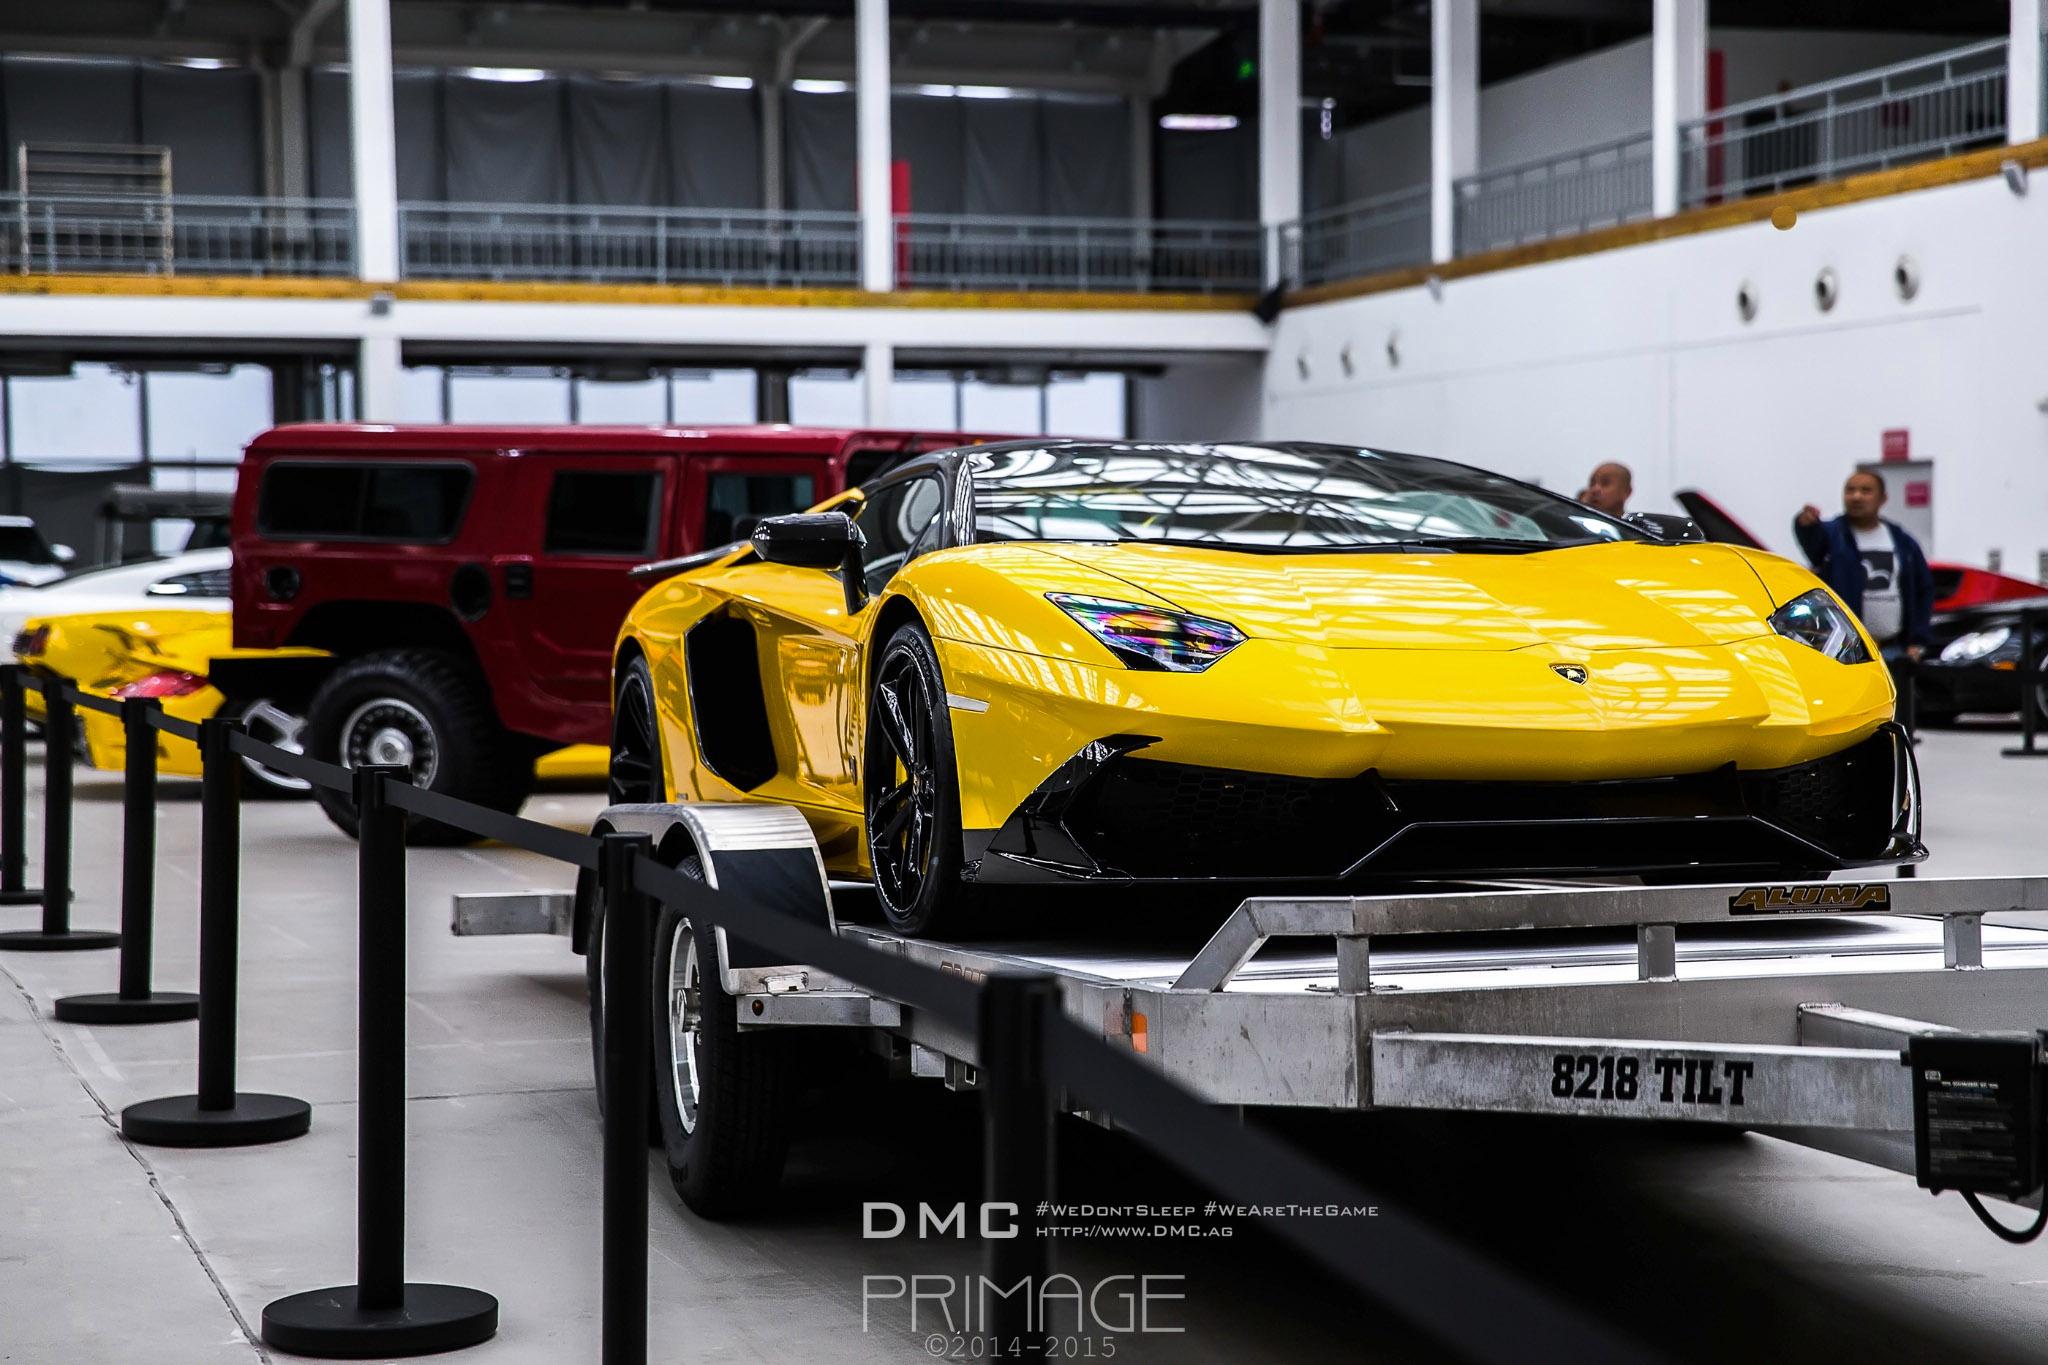 DMC Lamborghini Aventador LP720 Roadster photo #1